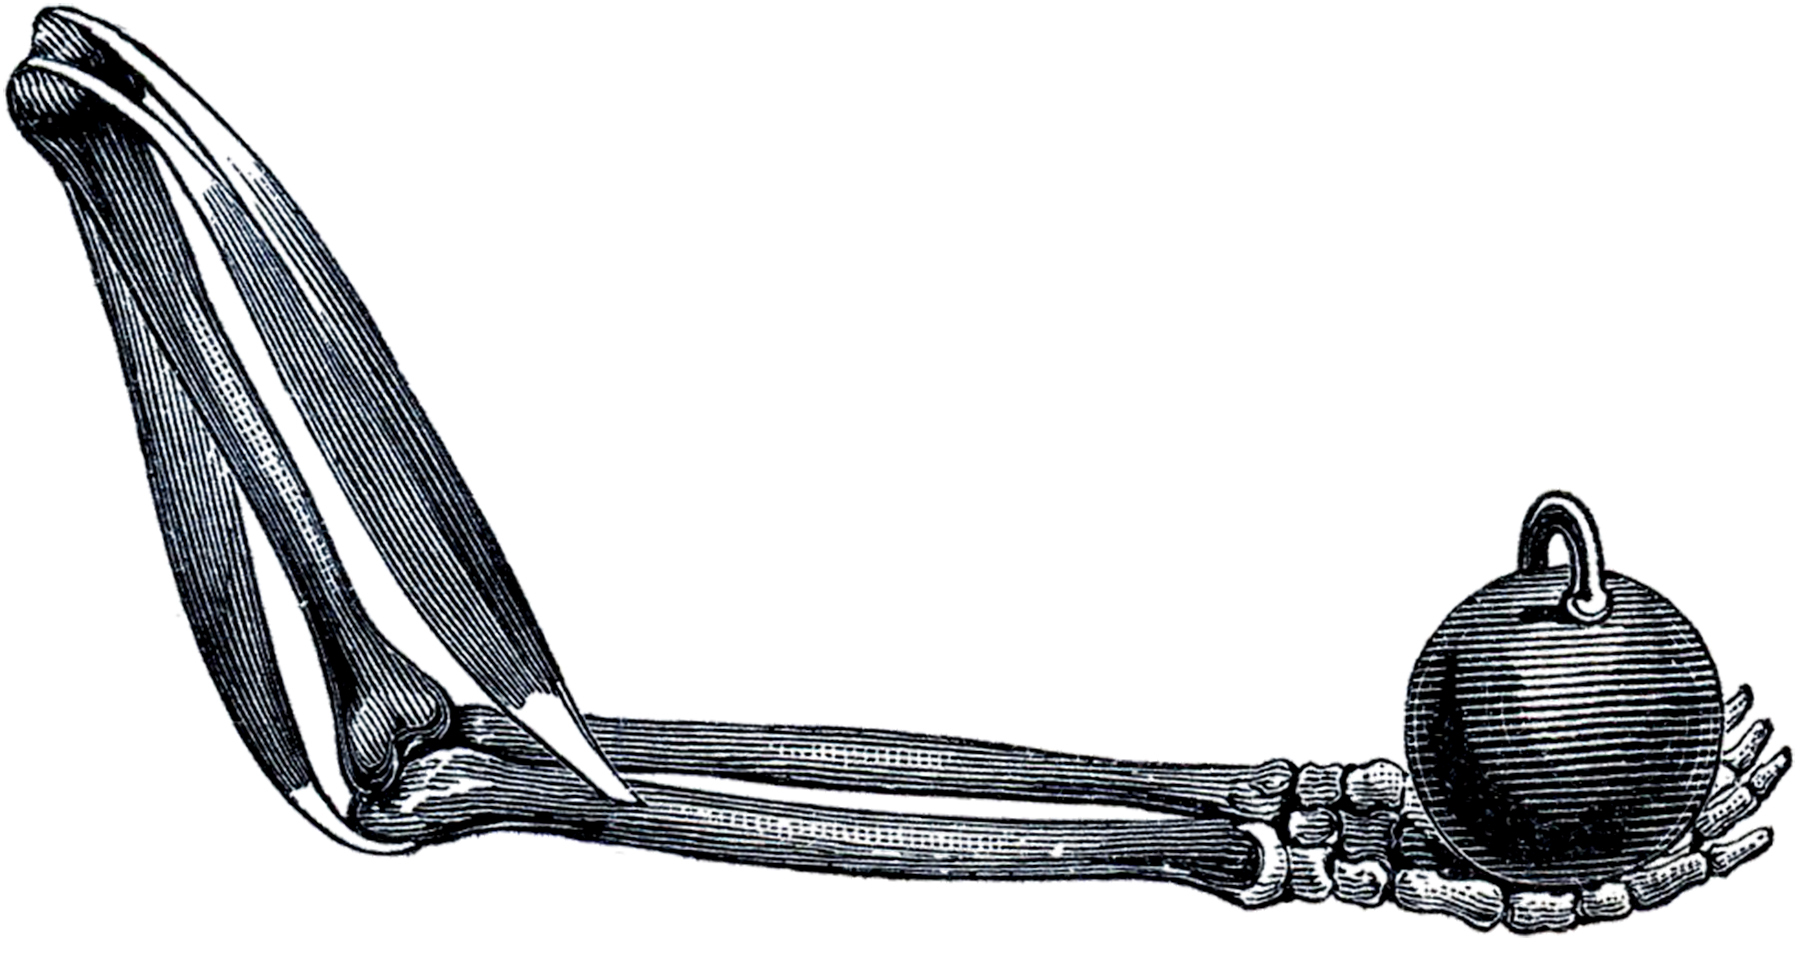 Halloween Skeleton Arm The Graphics Fairy